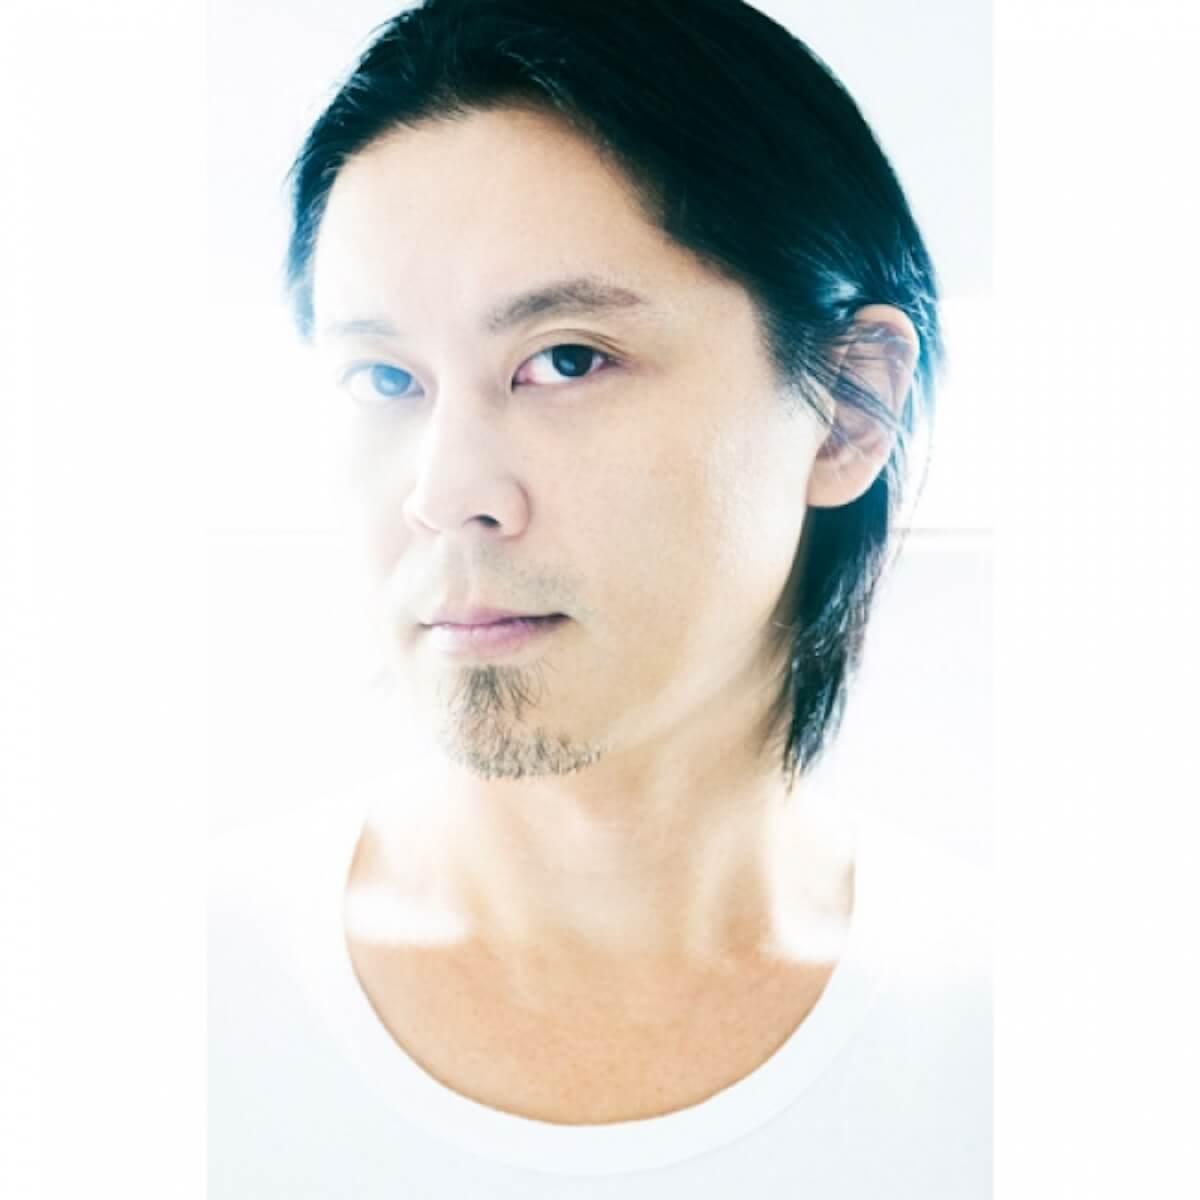 DOSEM × KEN ISHIIのスペシャルコラボパーティーが渋谷VISIONにて開催|U:ICHI、SAKIKO OSAWAらも登場 music190614vision-dosem-kenishii_1